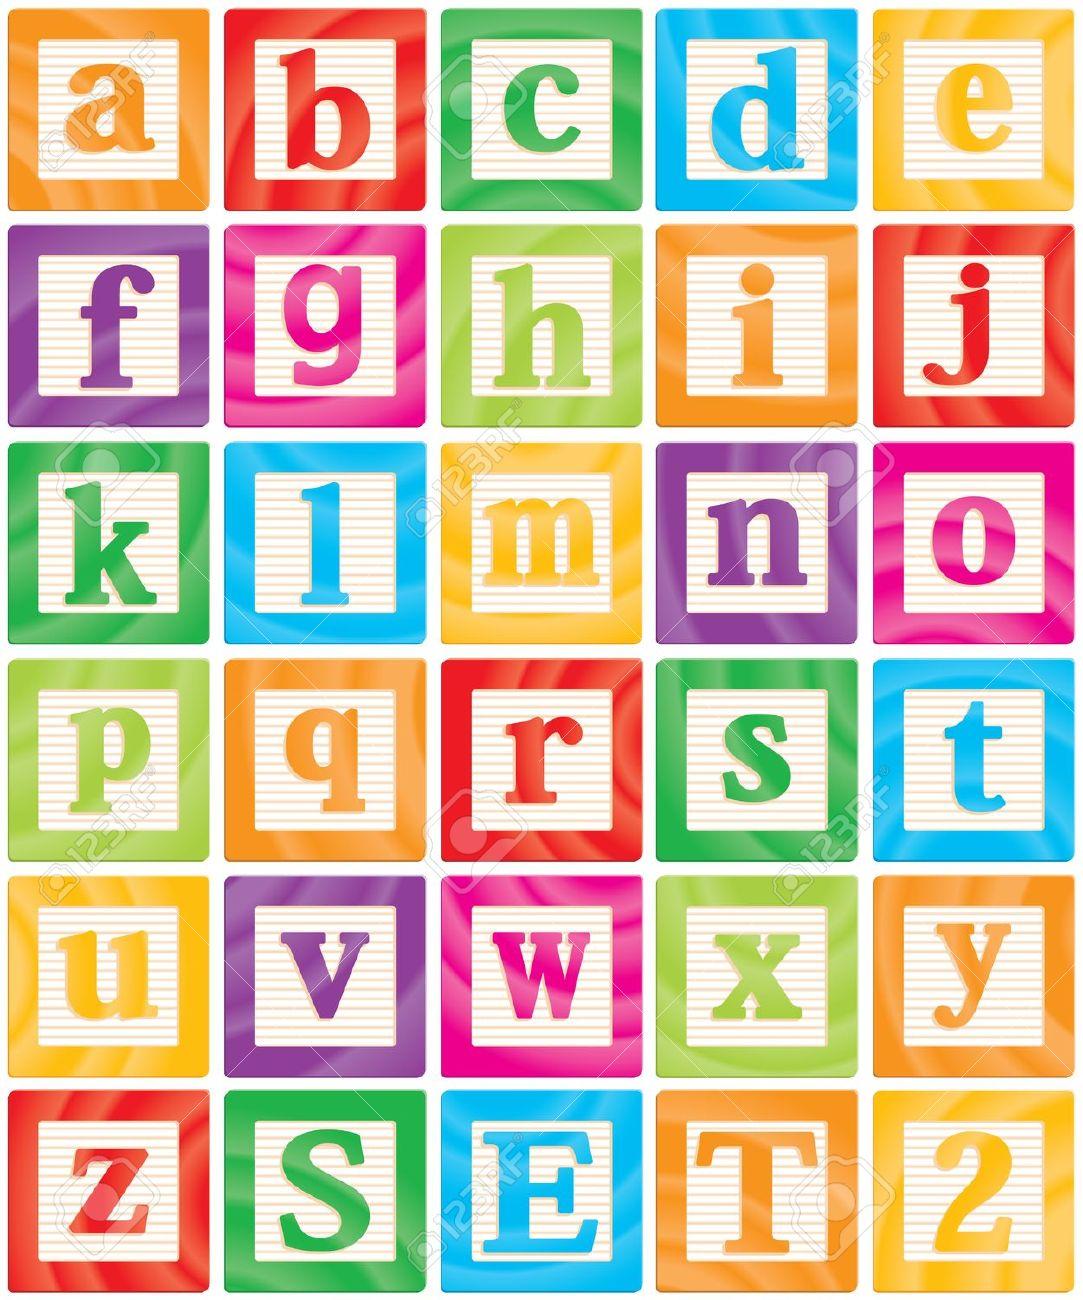 Free Alphabet Blocks Cliparts Download Free Clip Art Free Clip Art On Clipart Library